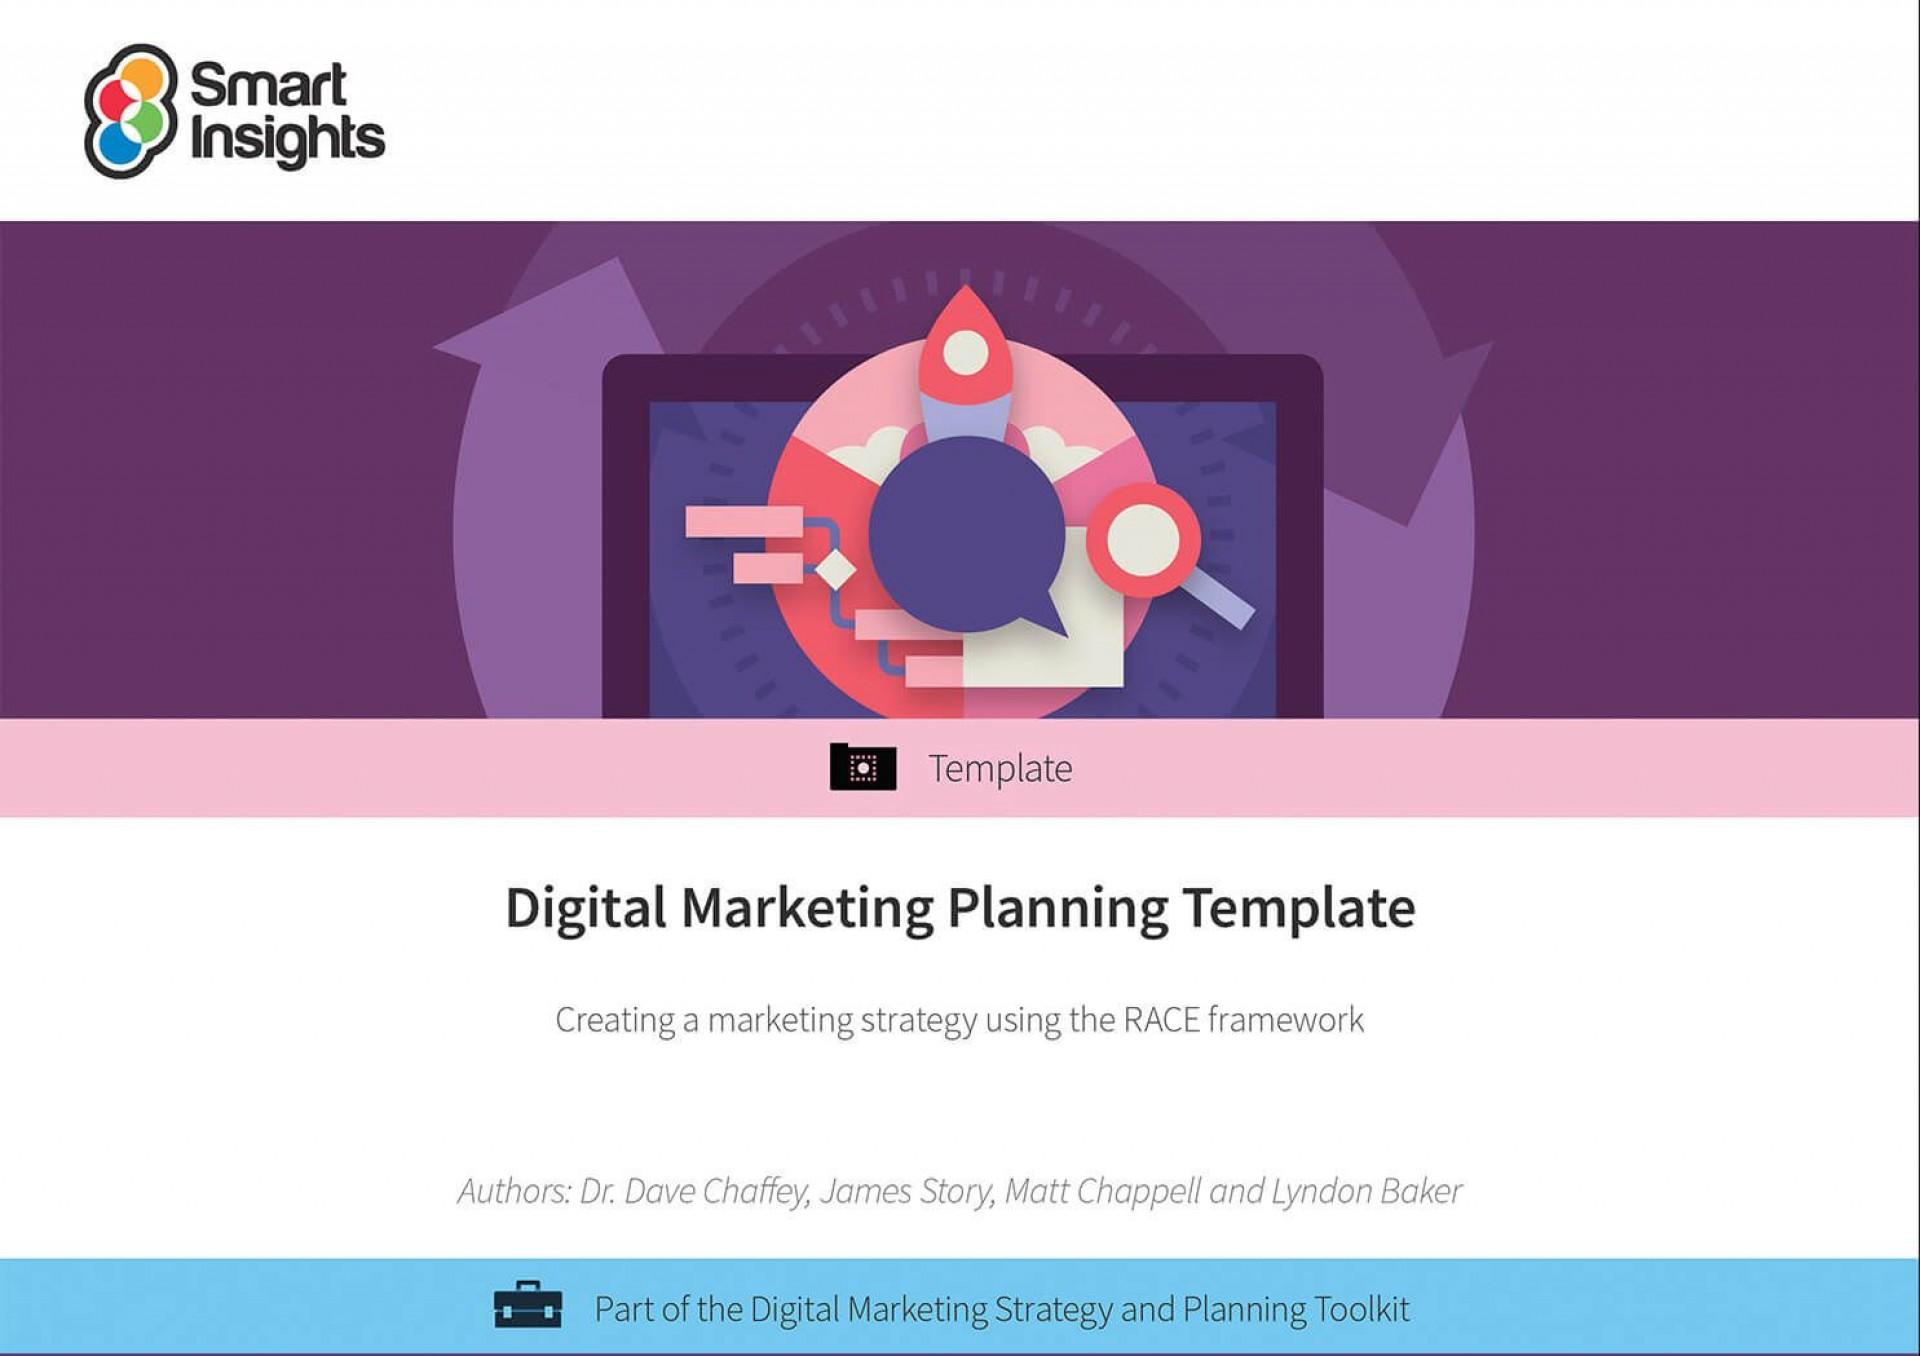 008 Beautiful Digital Marketing Plan Template Word Highest Quality 1920